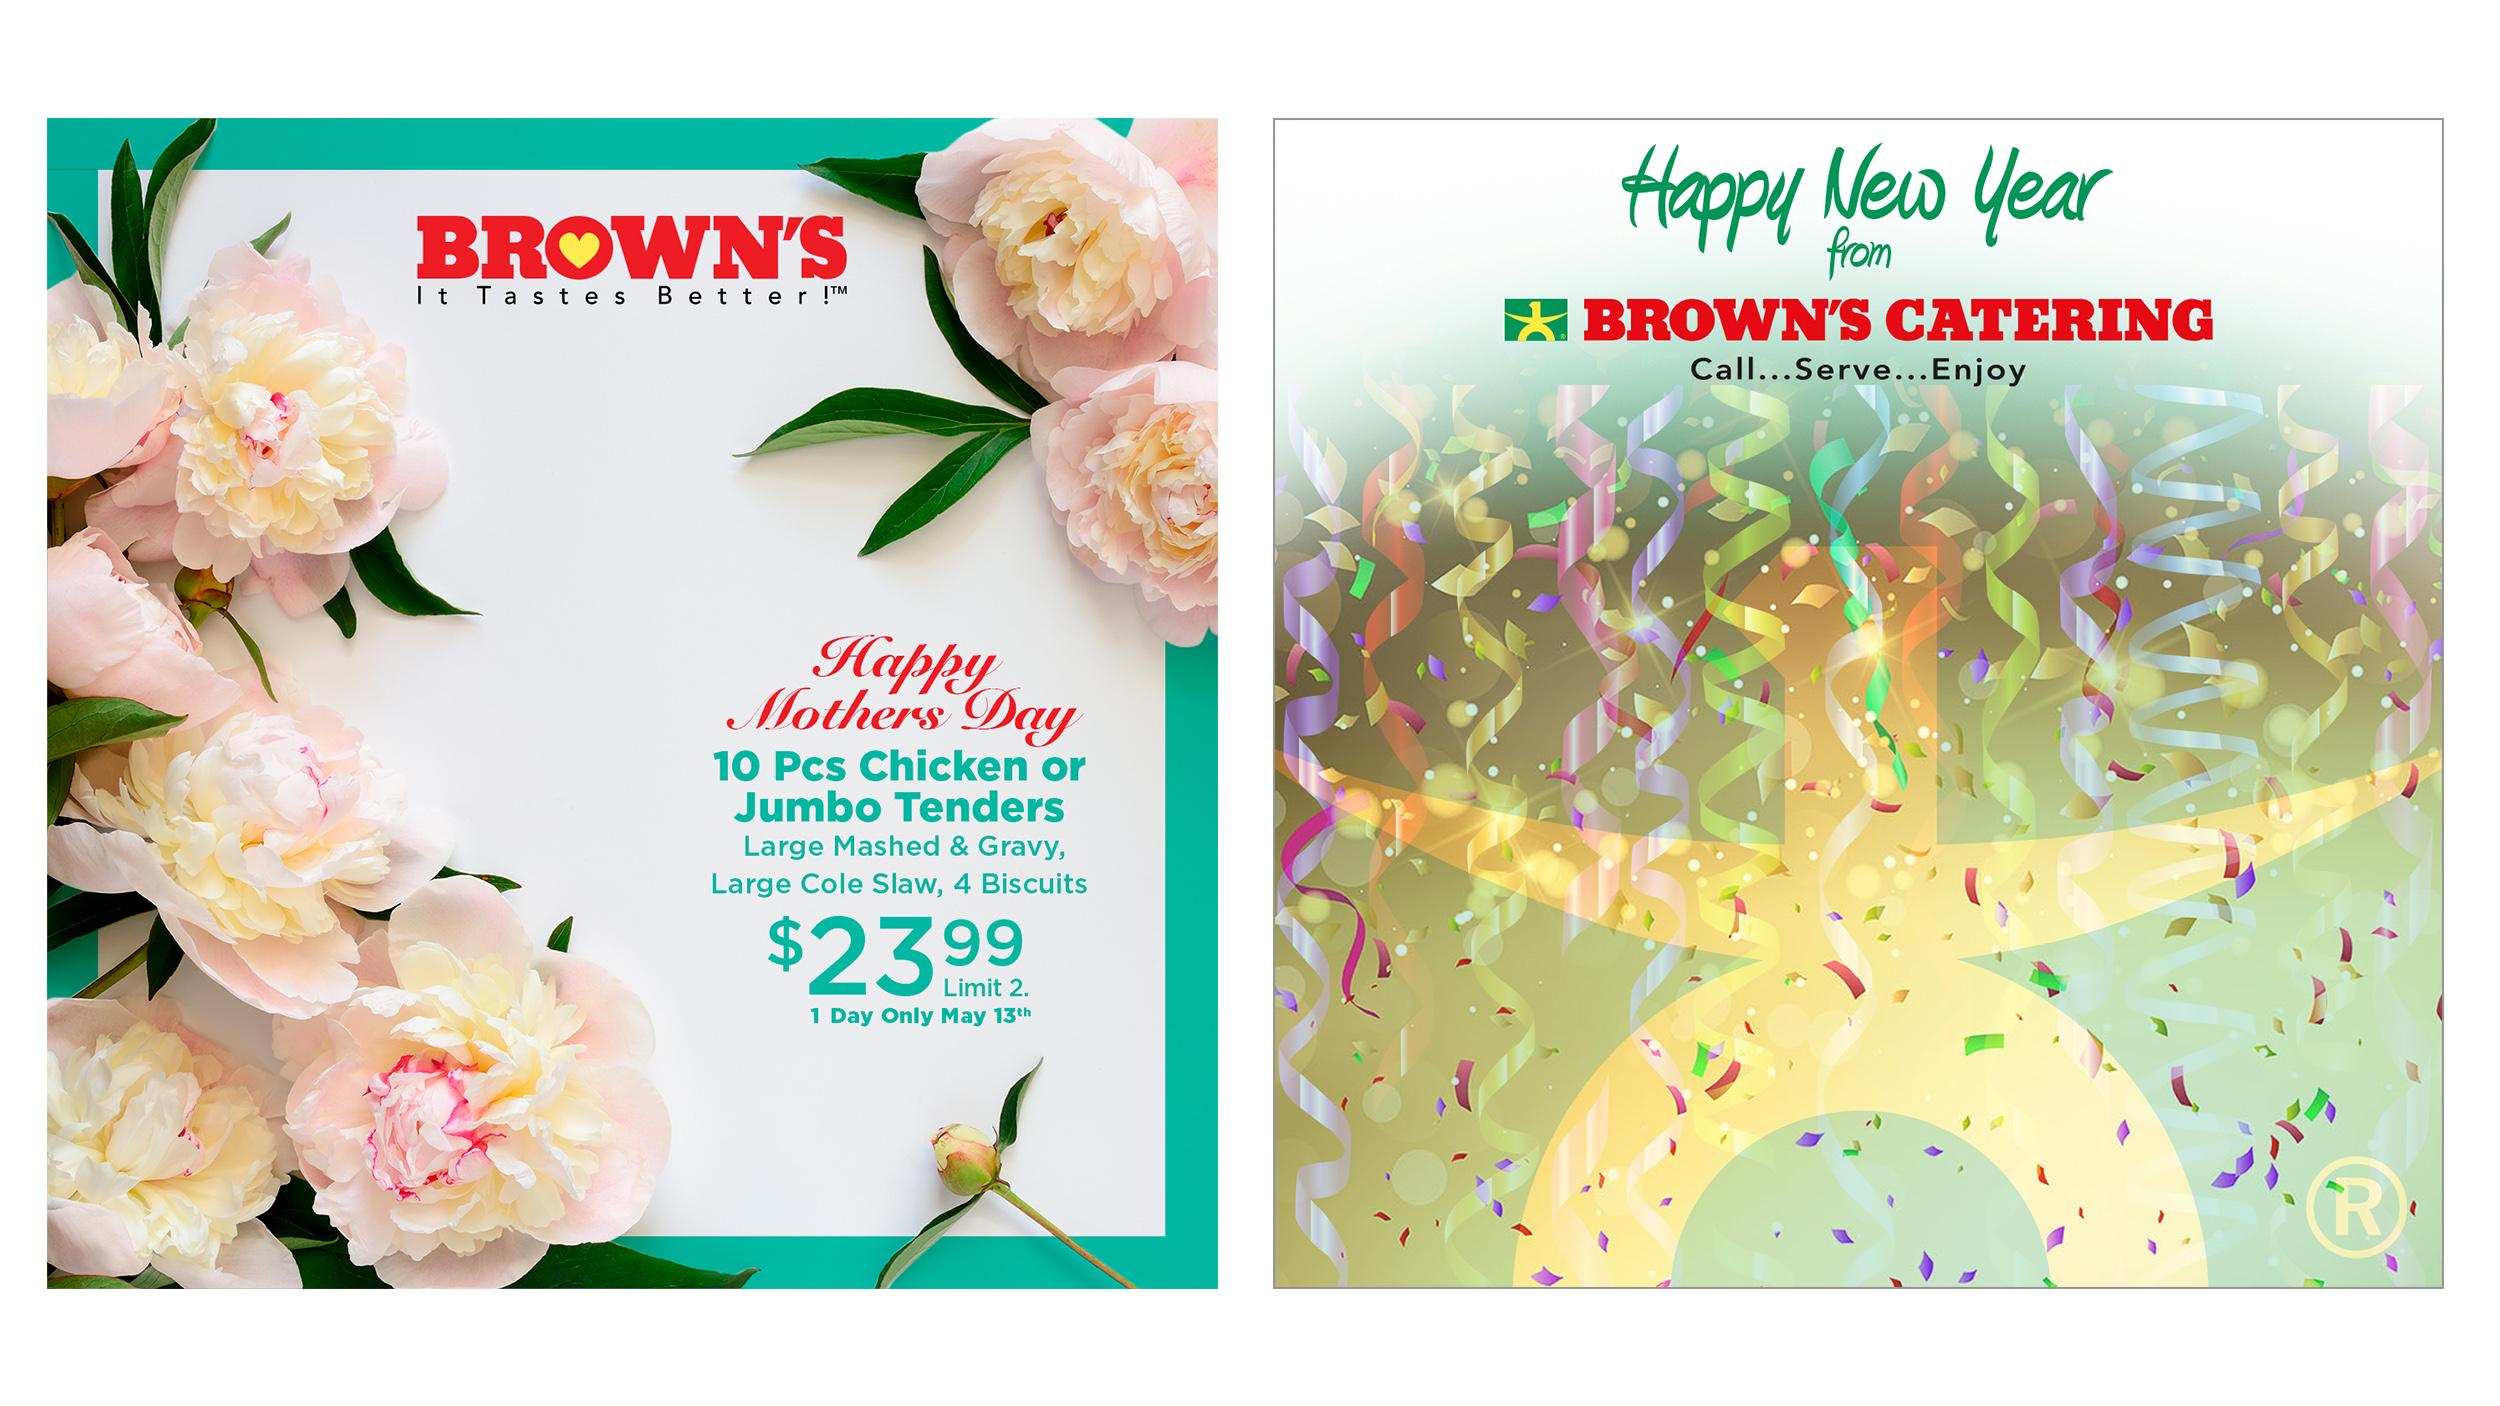 Browns-facebook-ads-DigitalDisplays-BigFishGraphicDesign.jpg